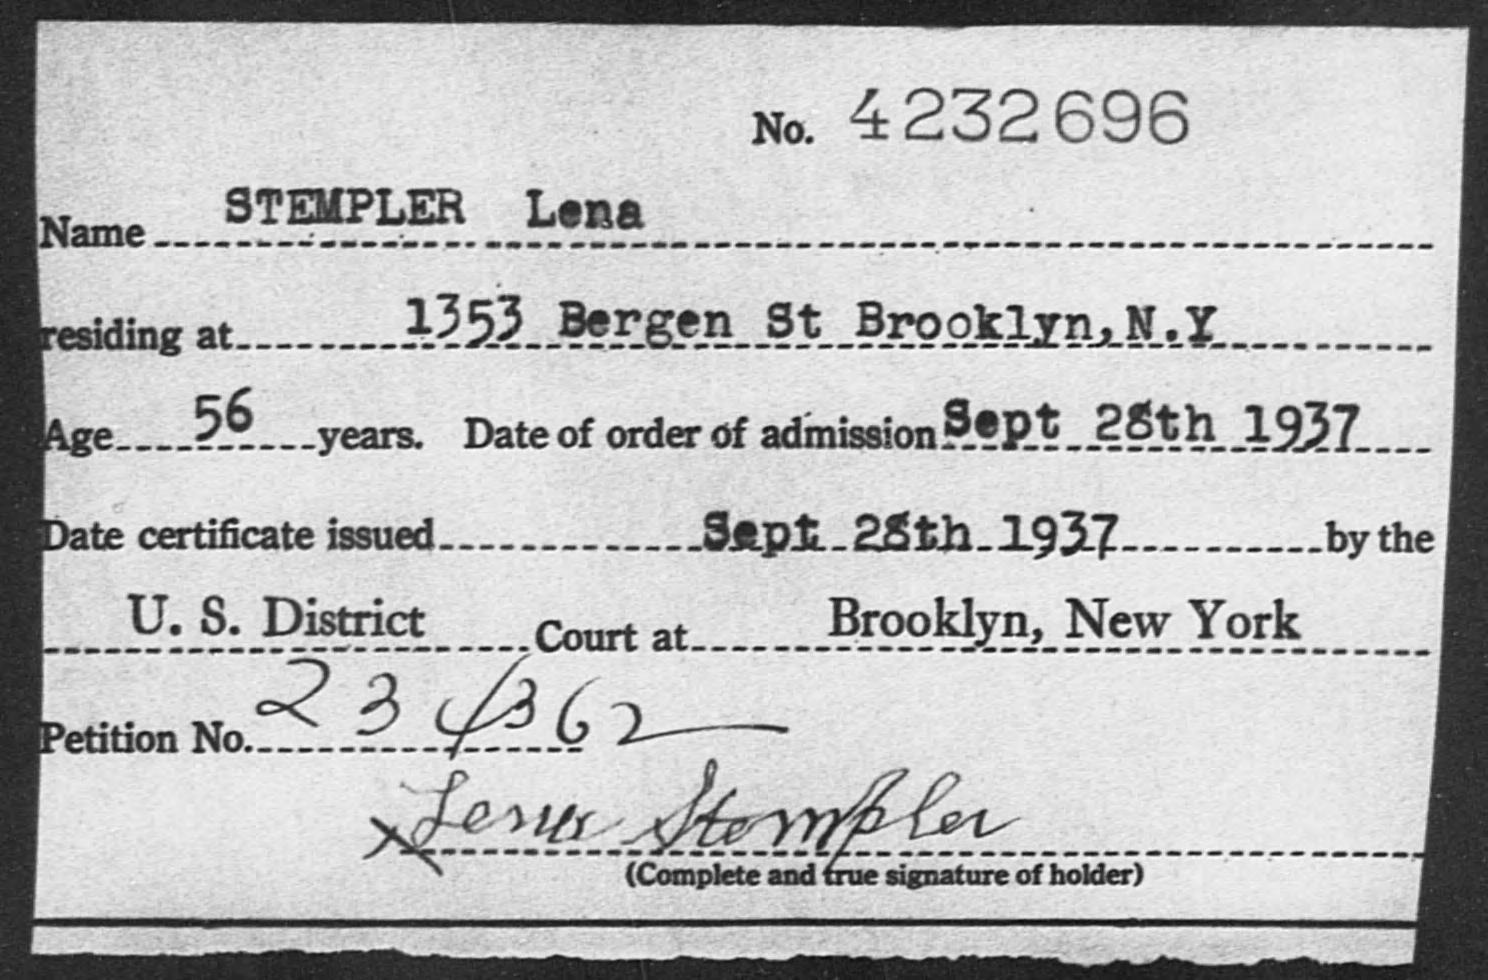 STEMPLER Lena - Born: [BLANK], Naturalized: 1937